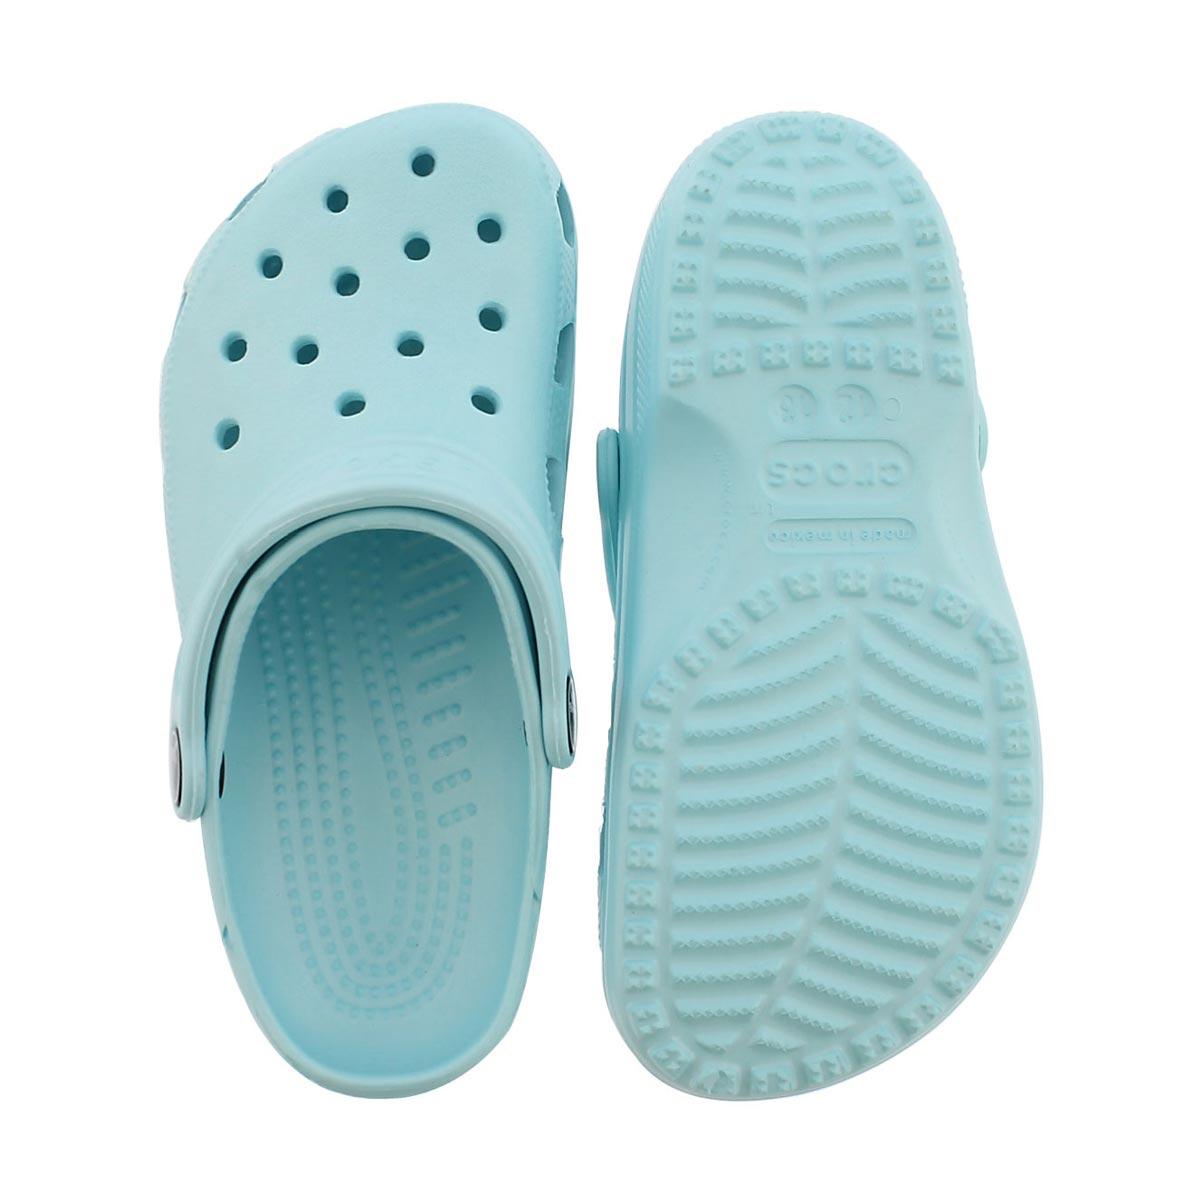 Grls Classic ice blue EVA comfort clog